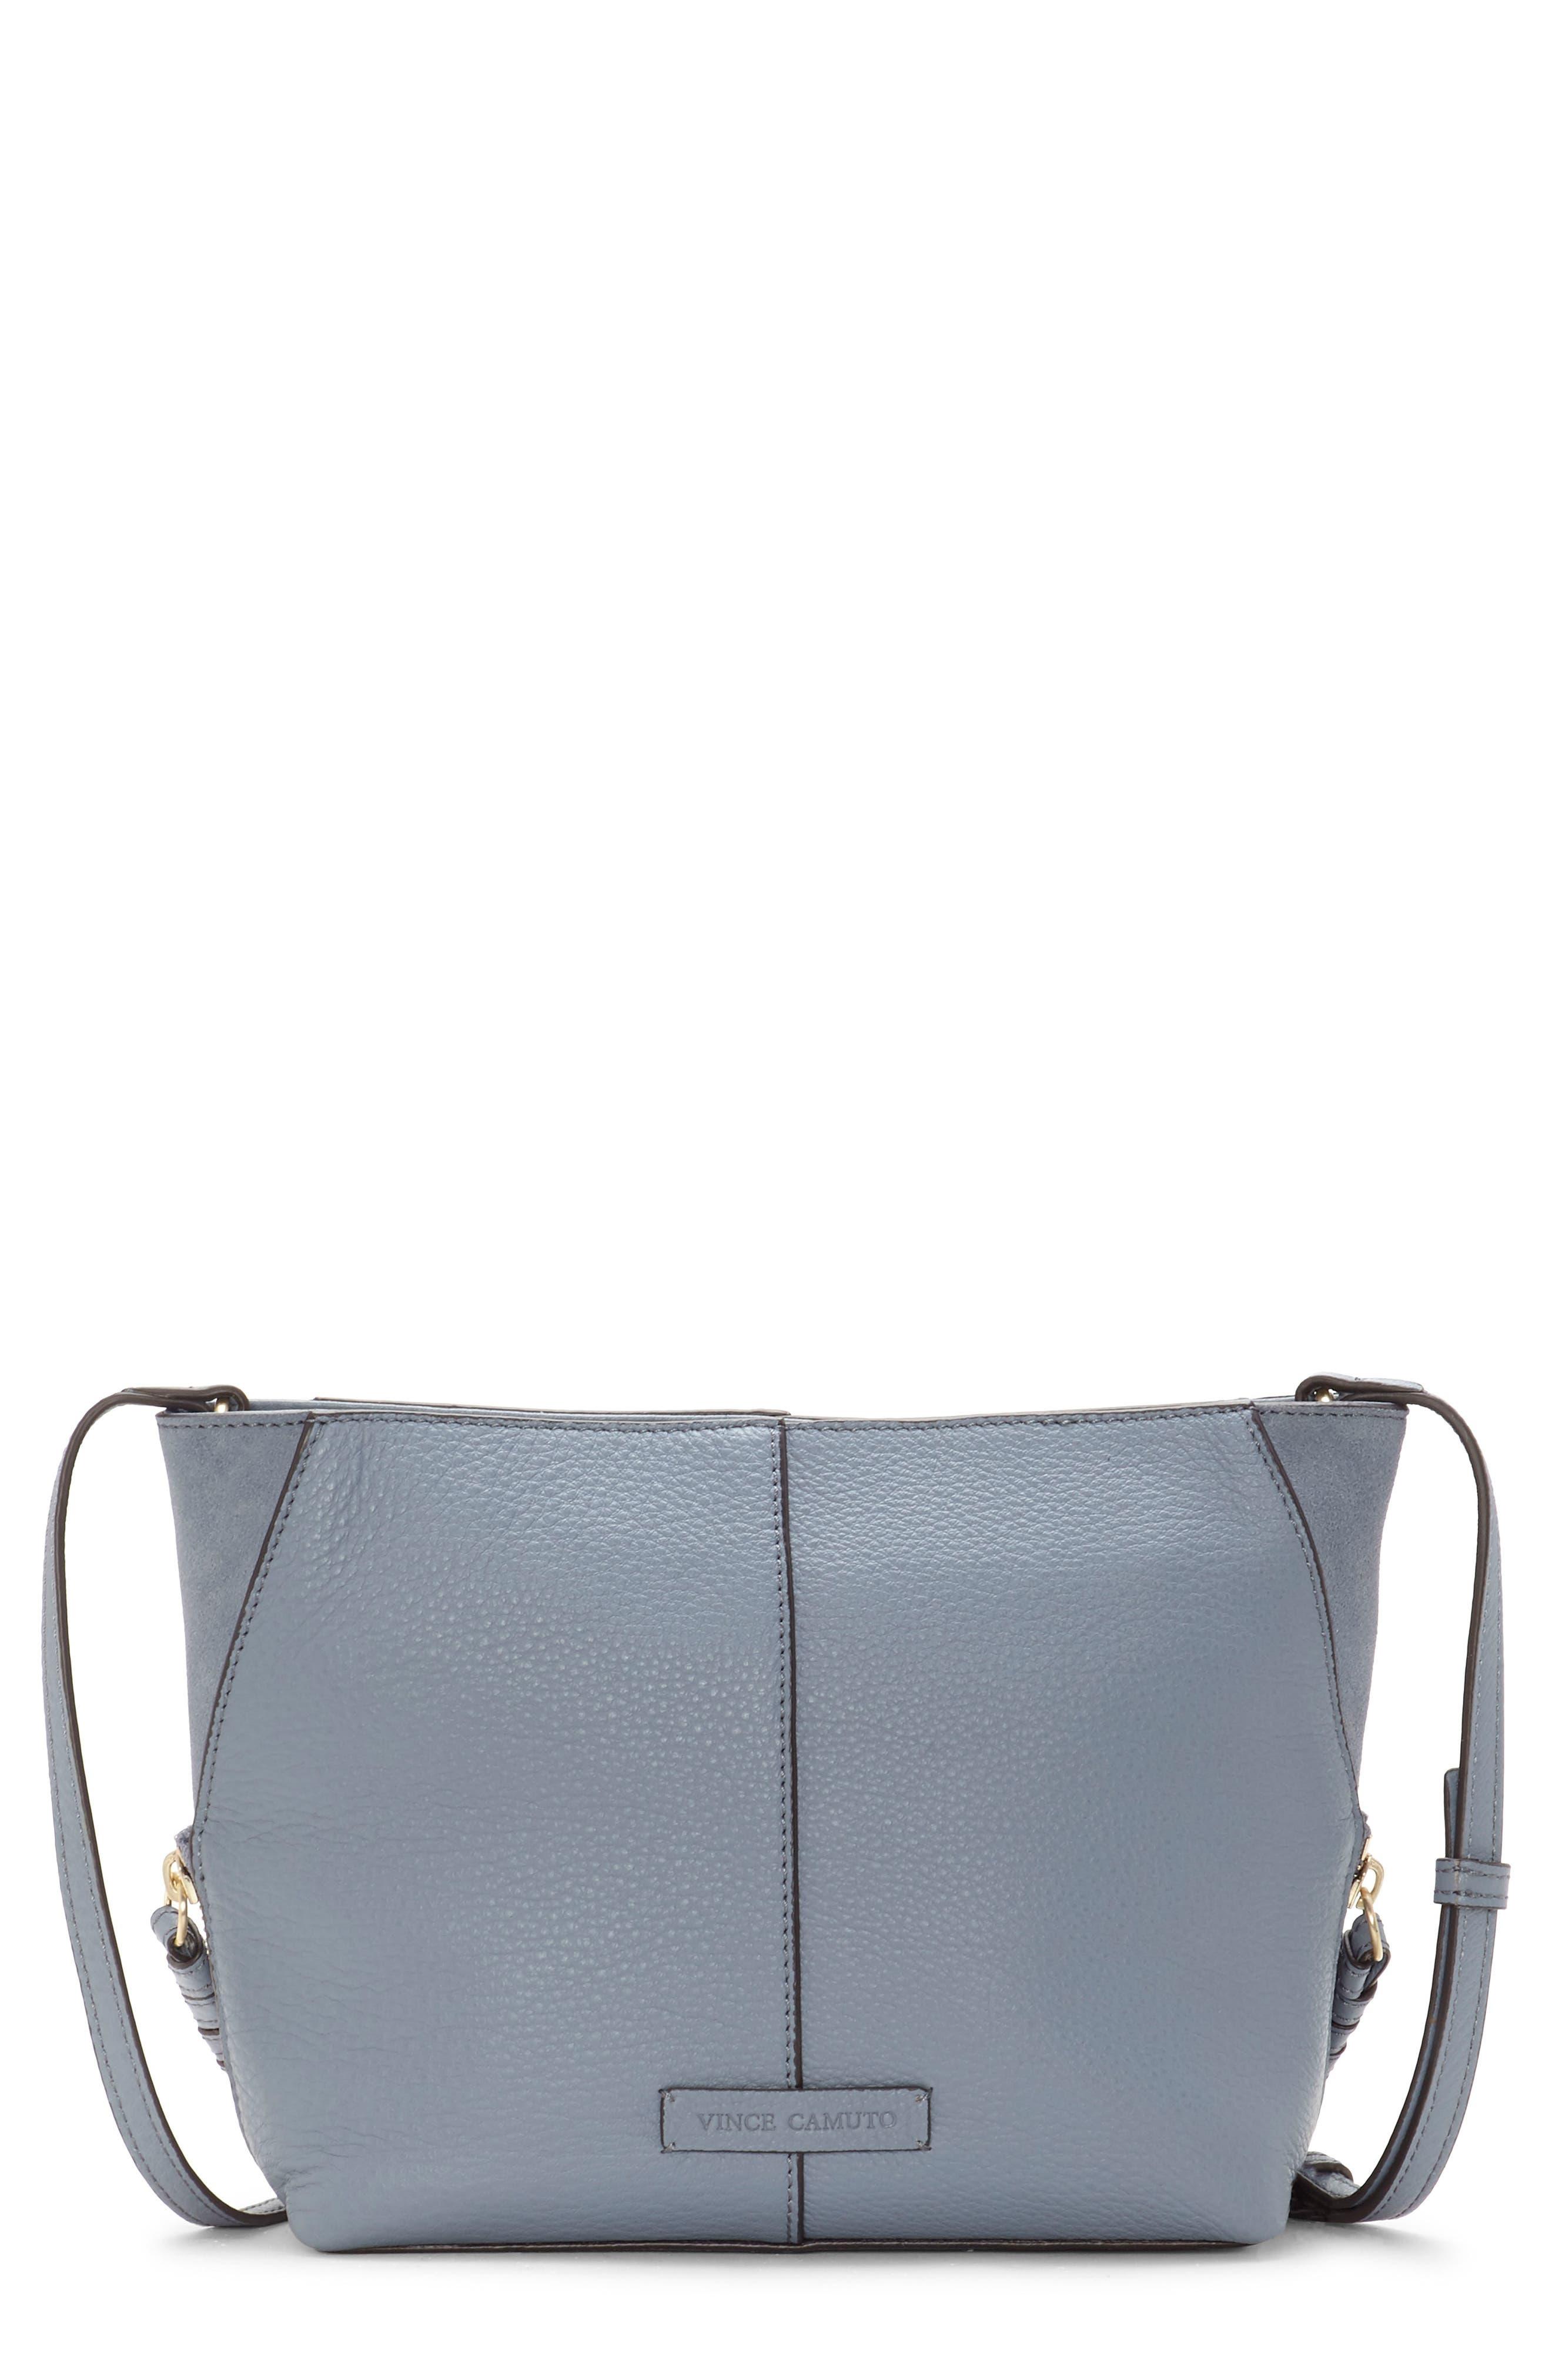 38a4654b2b Vince Camuto Cory Leather Crossbody Bag - Blue